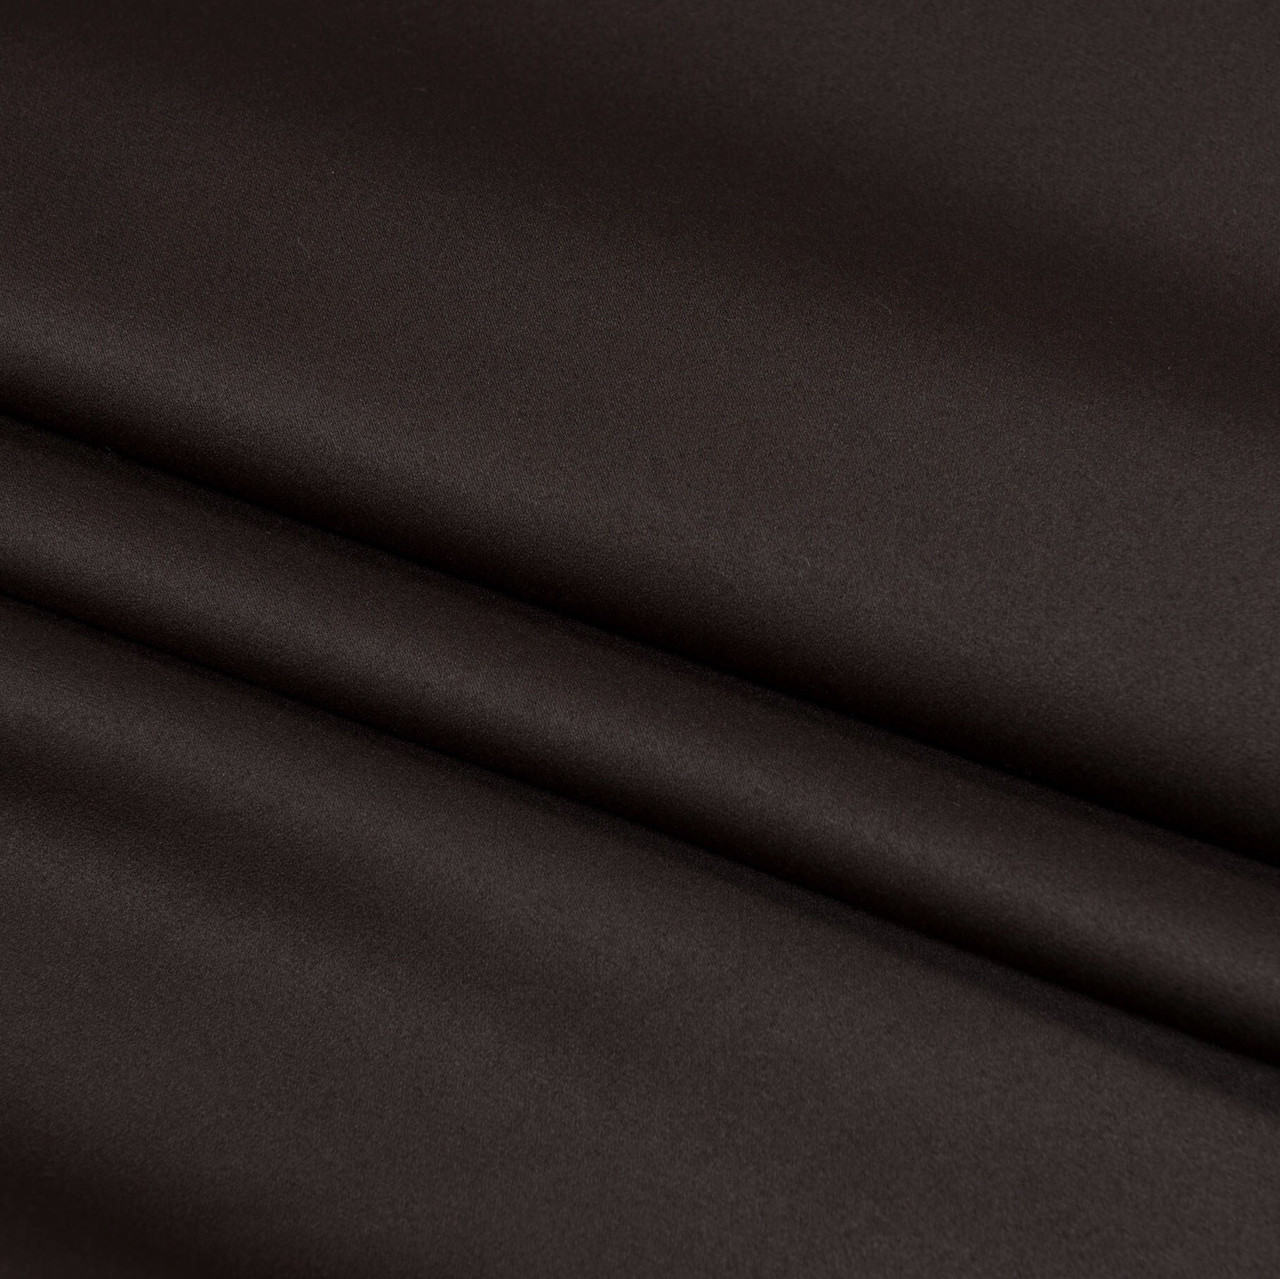 "Декоративная ткань Блэкаут люкс / blackout lux ""Темно-коричневый"""